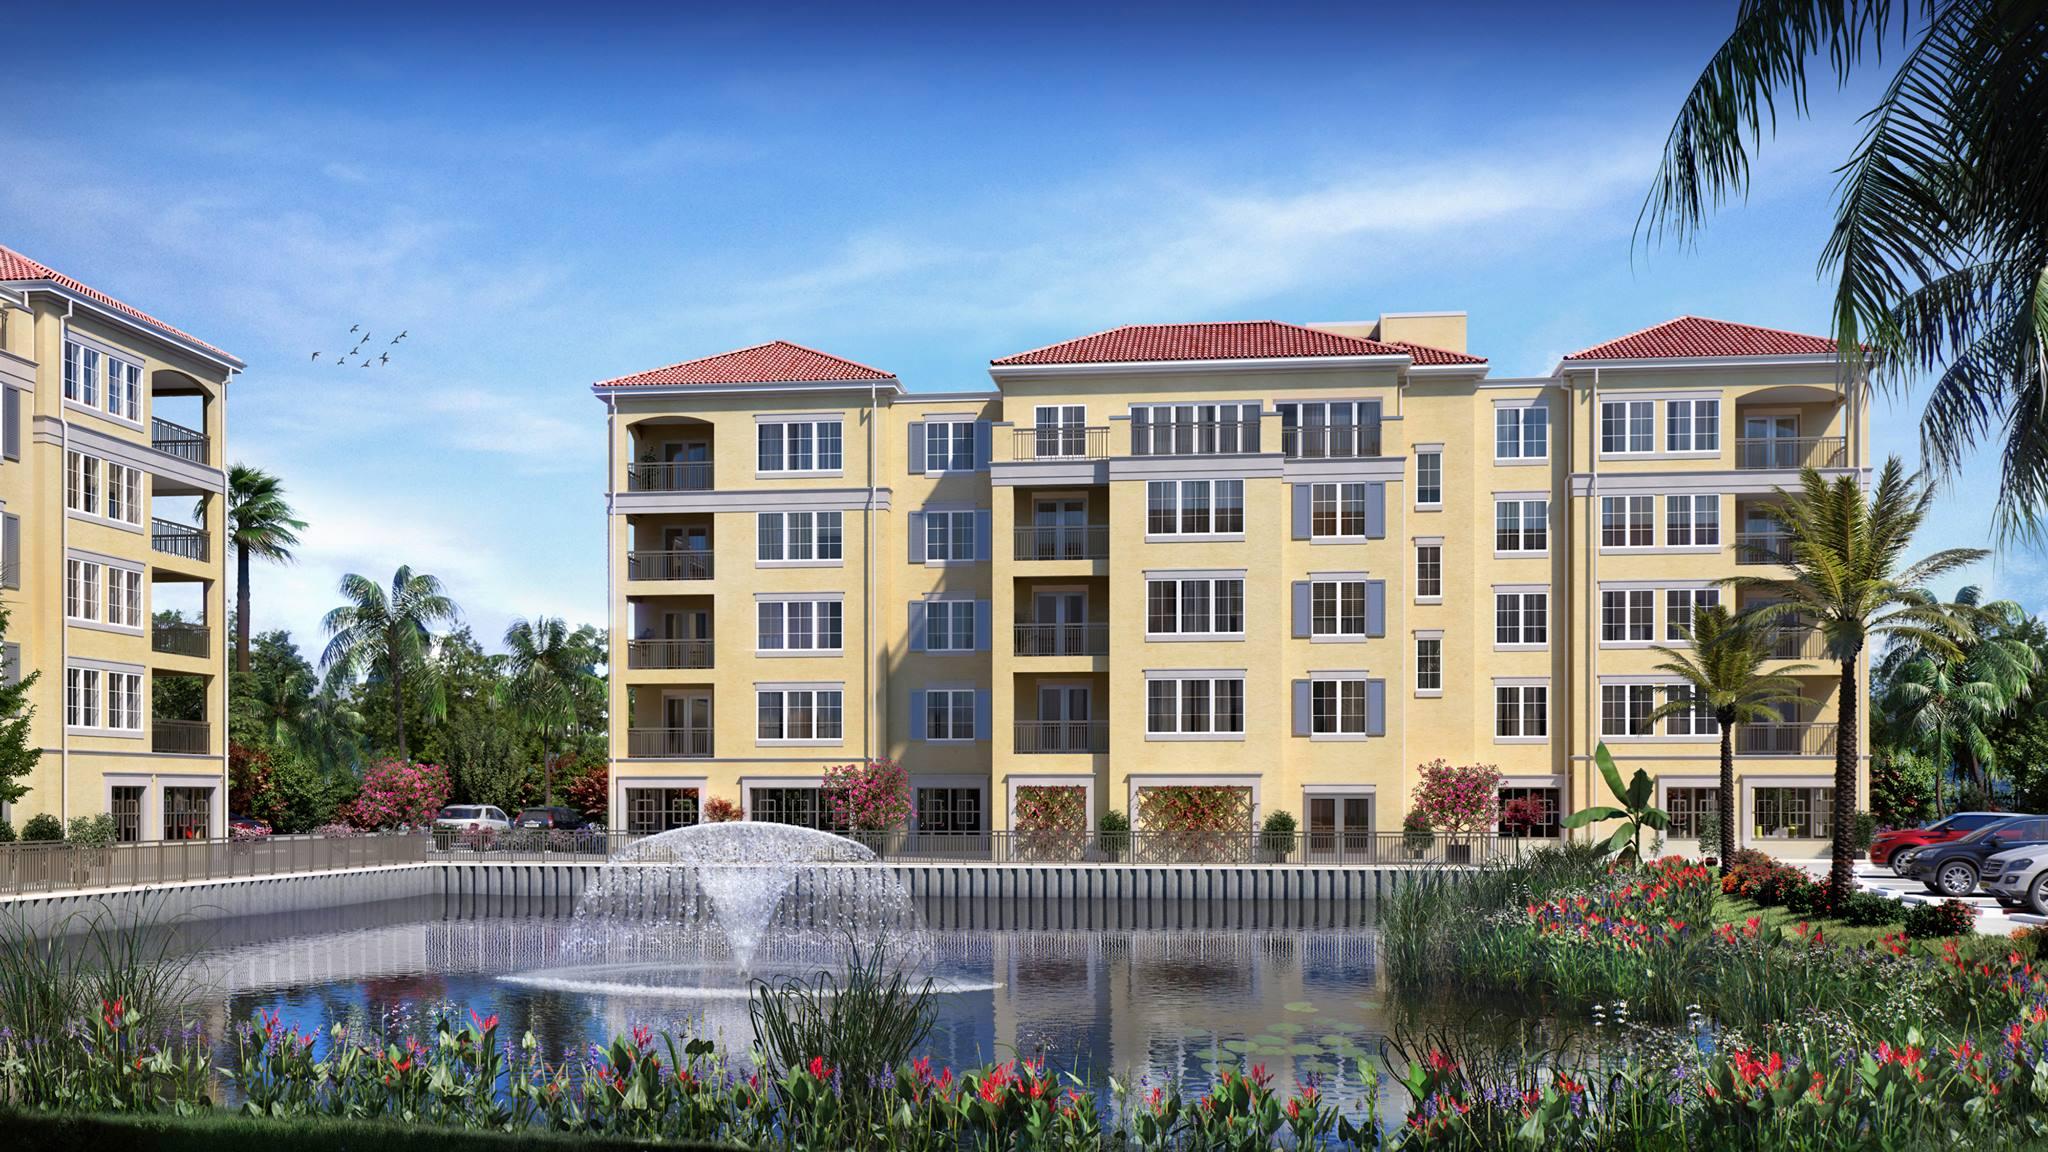 Village on the Isle - Venice, FL